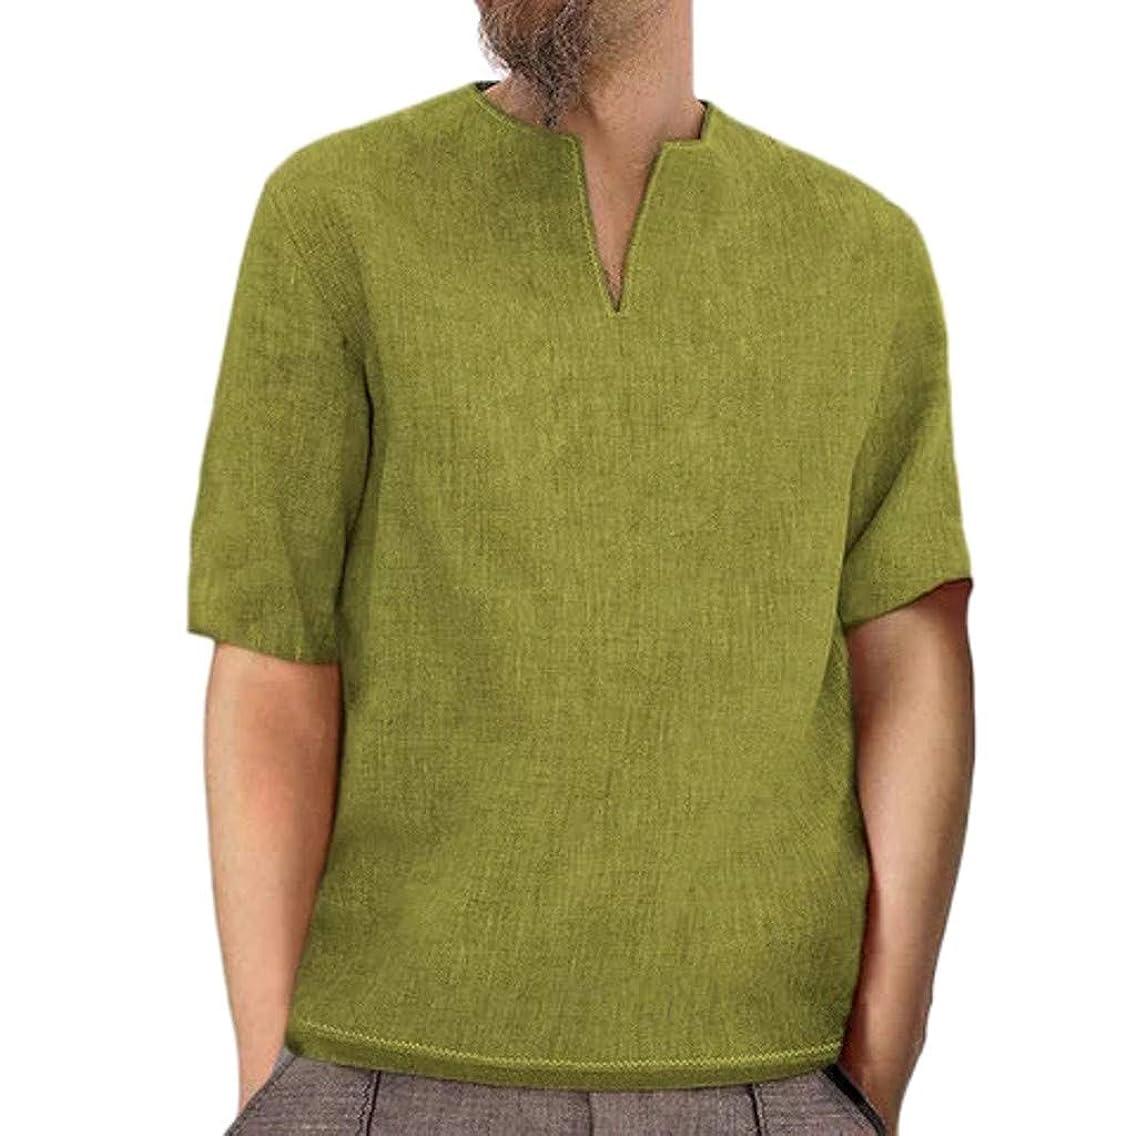 Goldweather Men Short Sleeve T Shirt Casual Summer Retro Cotton Linen V Neck Hippie Shirts Workout Fitness Beach Yoga Blouse Top